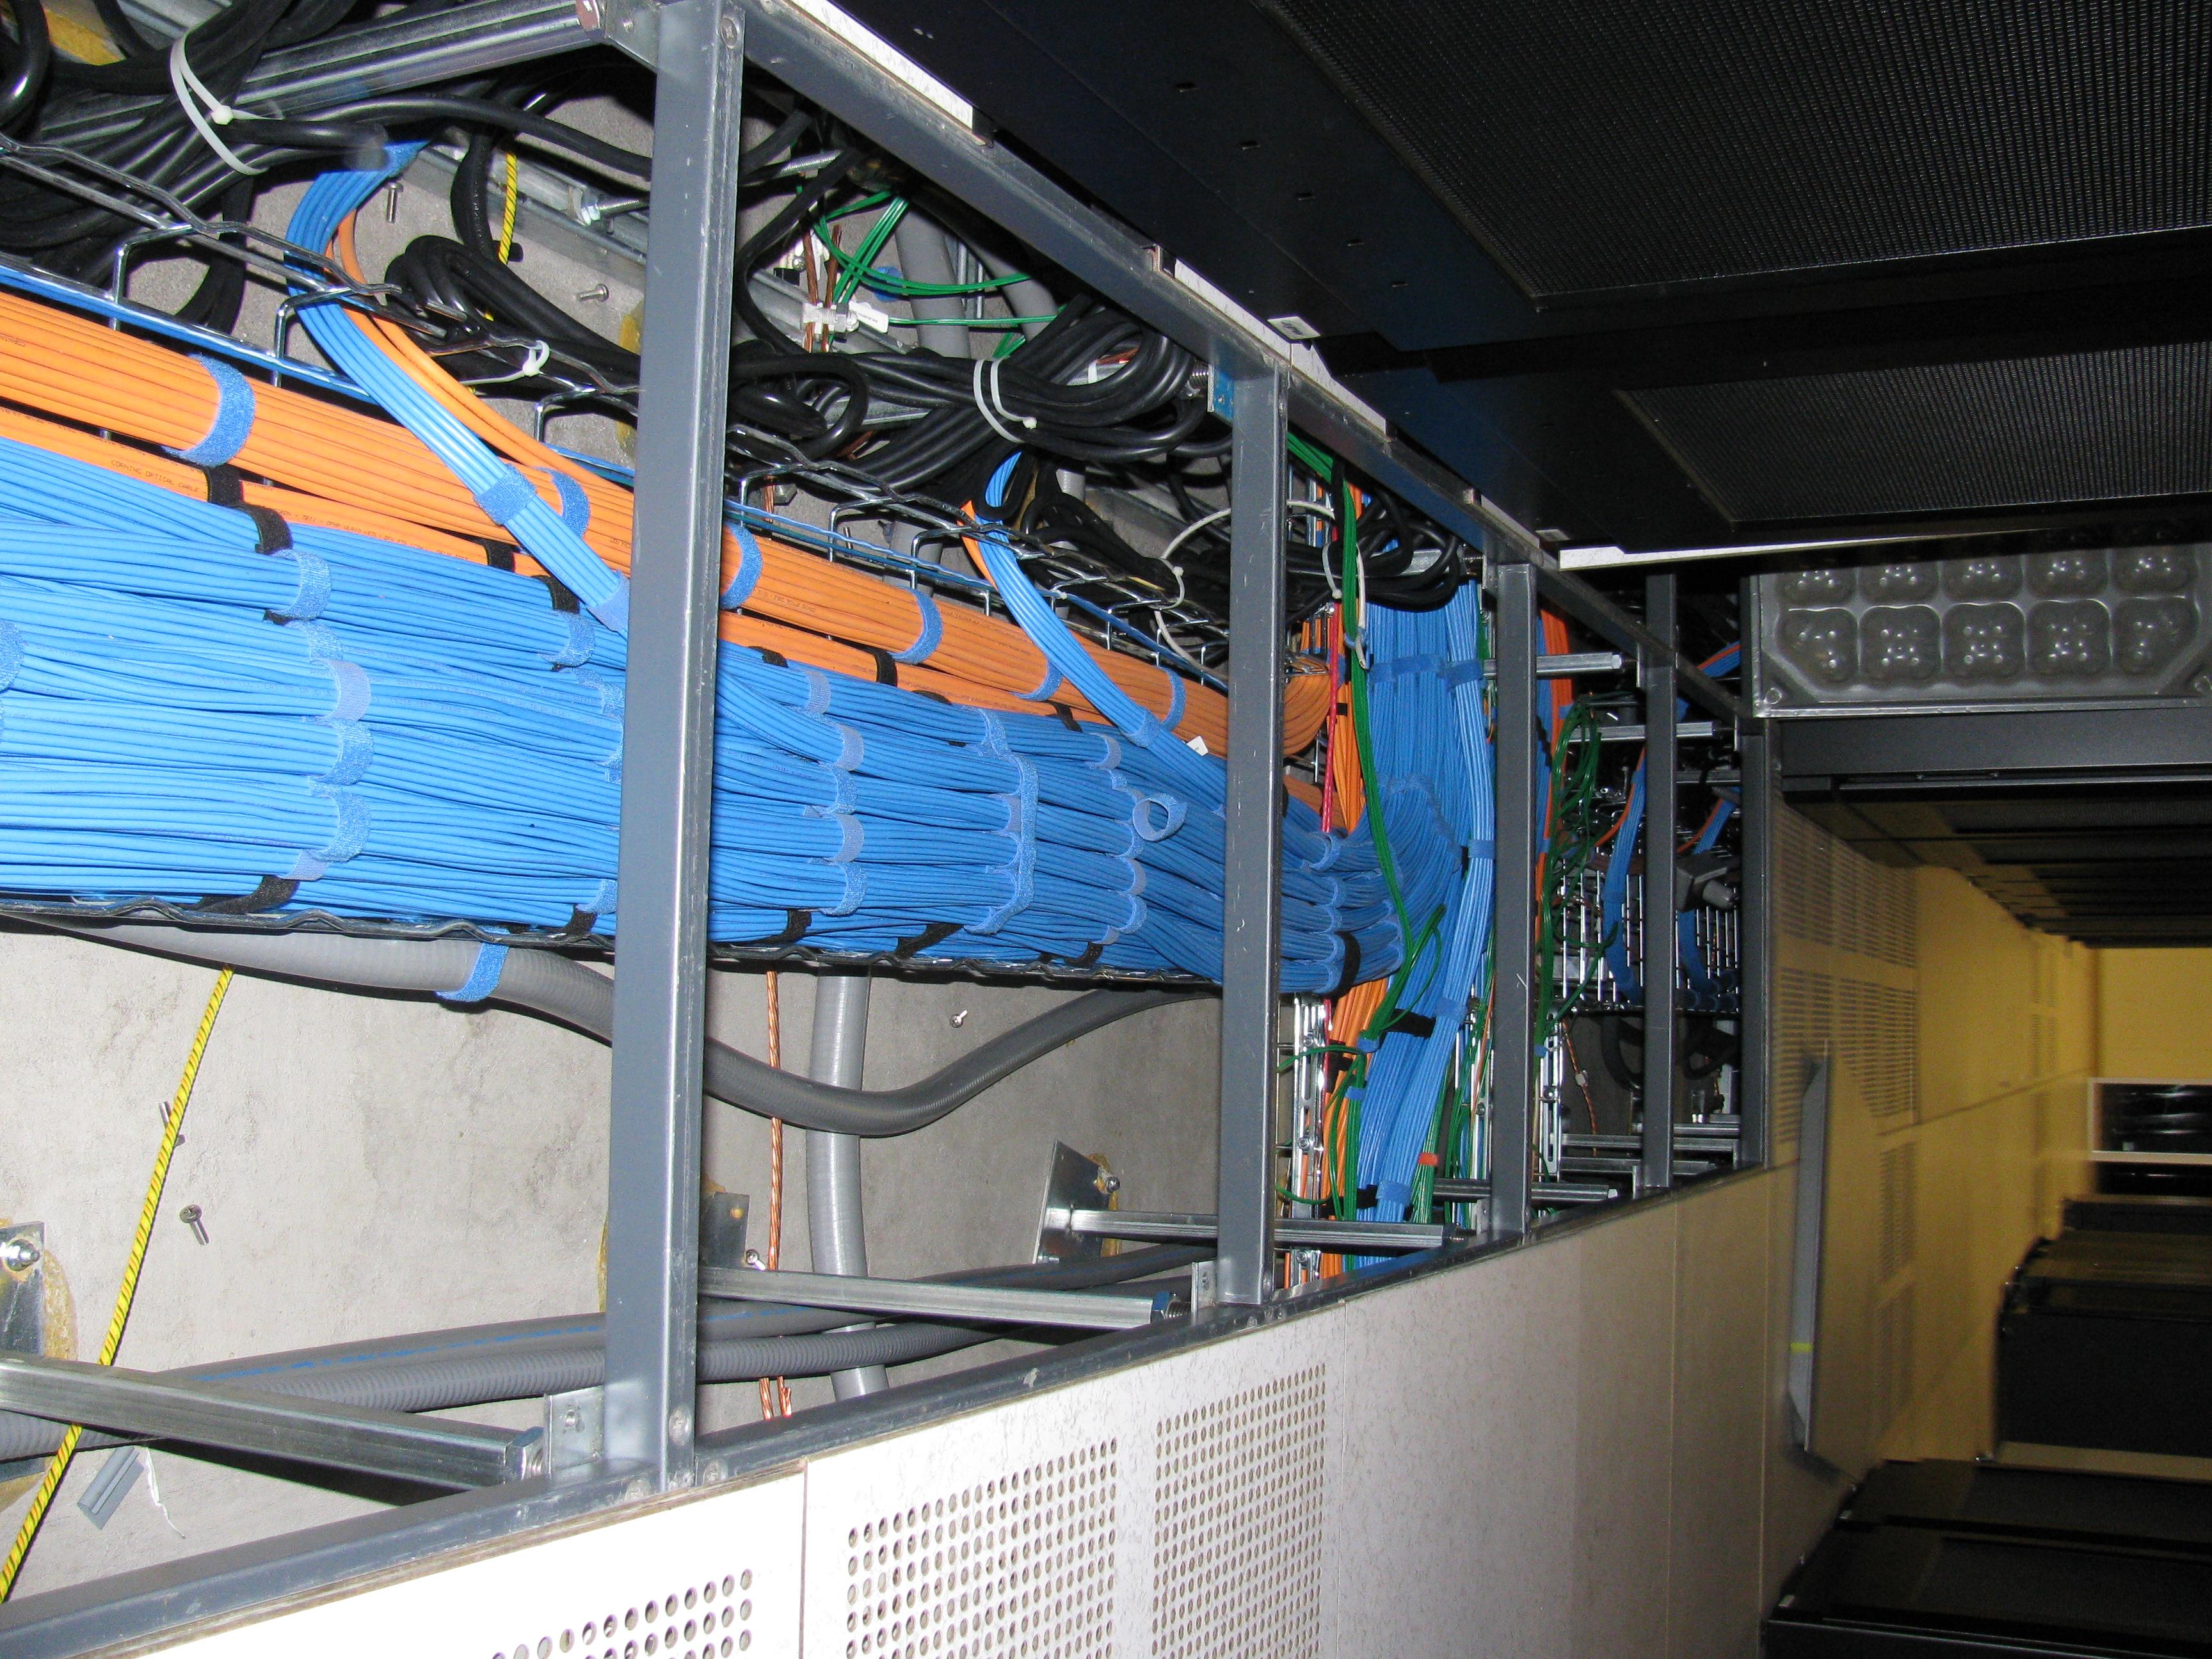 File:Under Floor Cable Runs Str 2